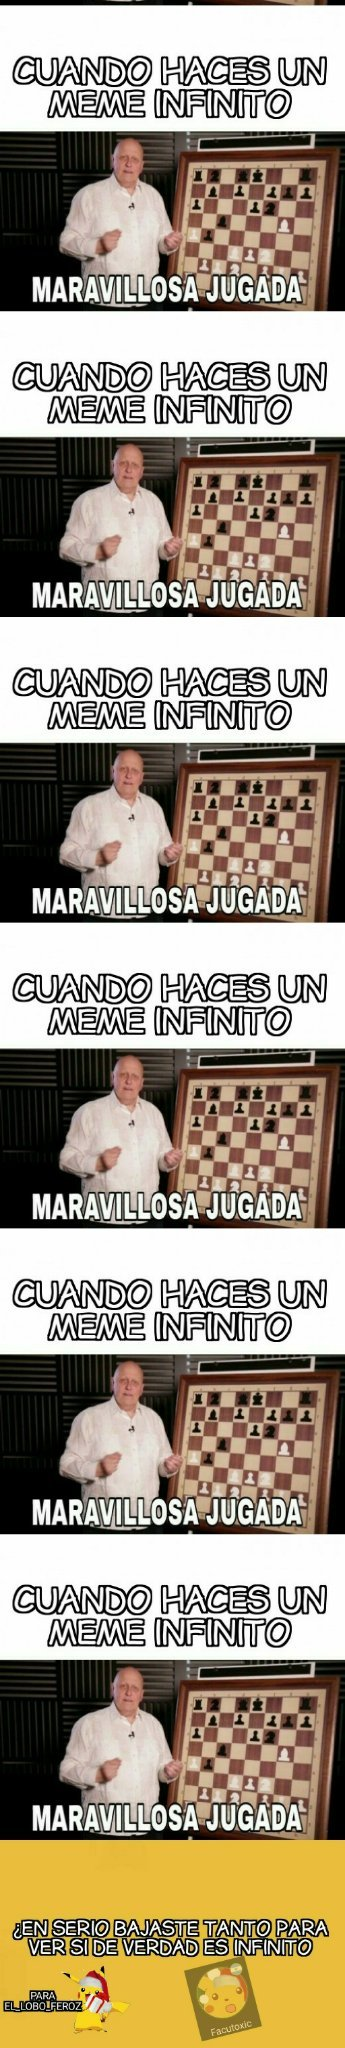 Meme infinito